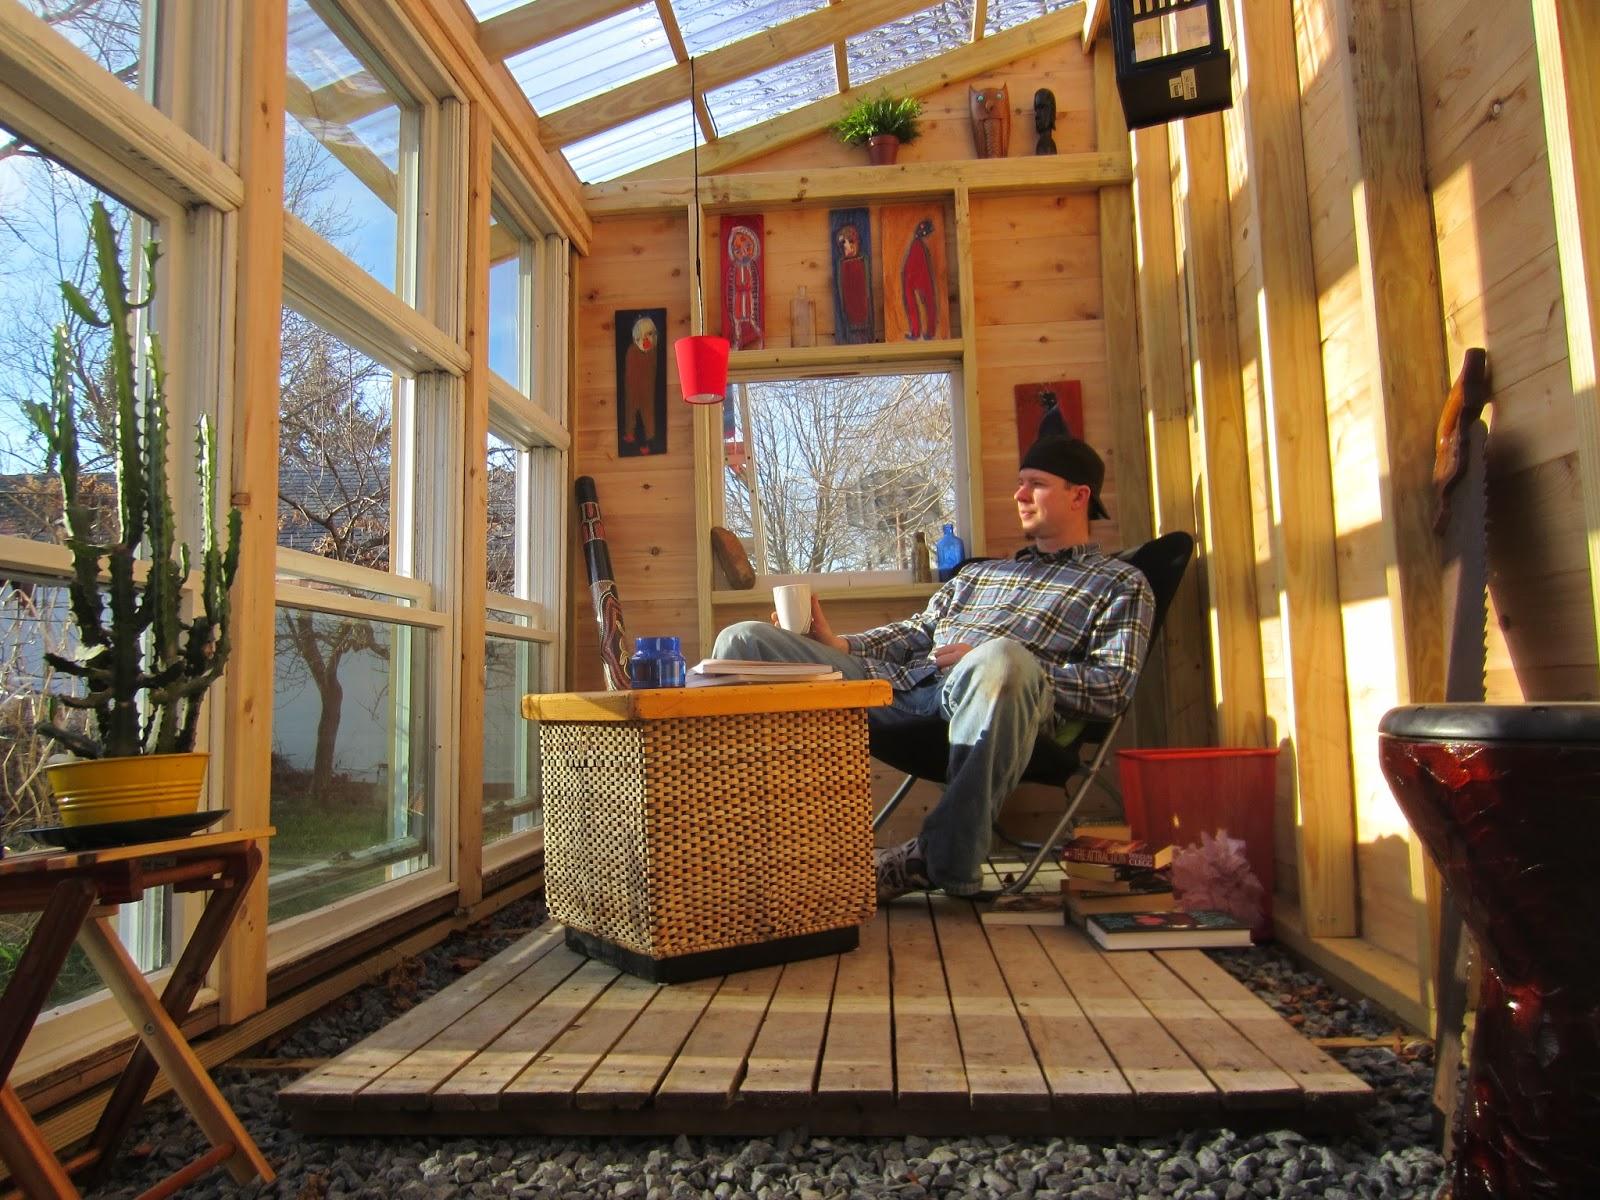 Tiny Home Designs: Relaxshacks.com: A THREE DAY, HANDS-ON Building And Design